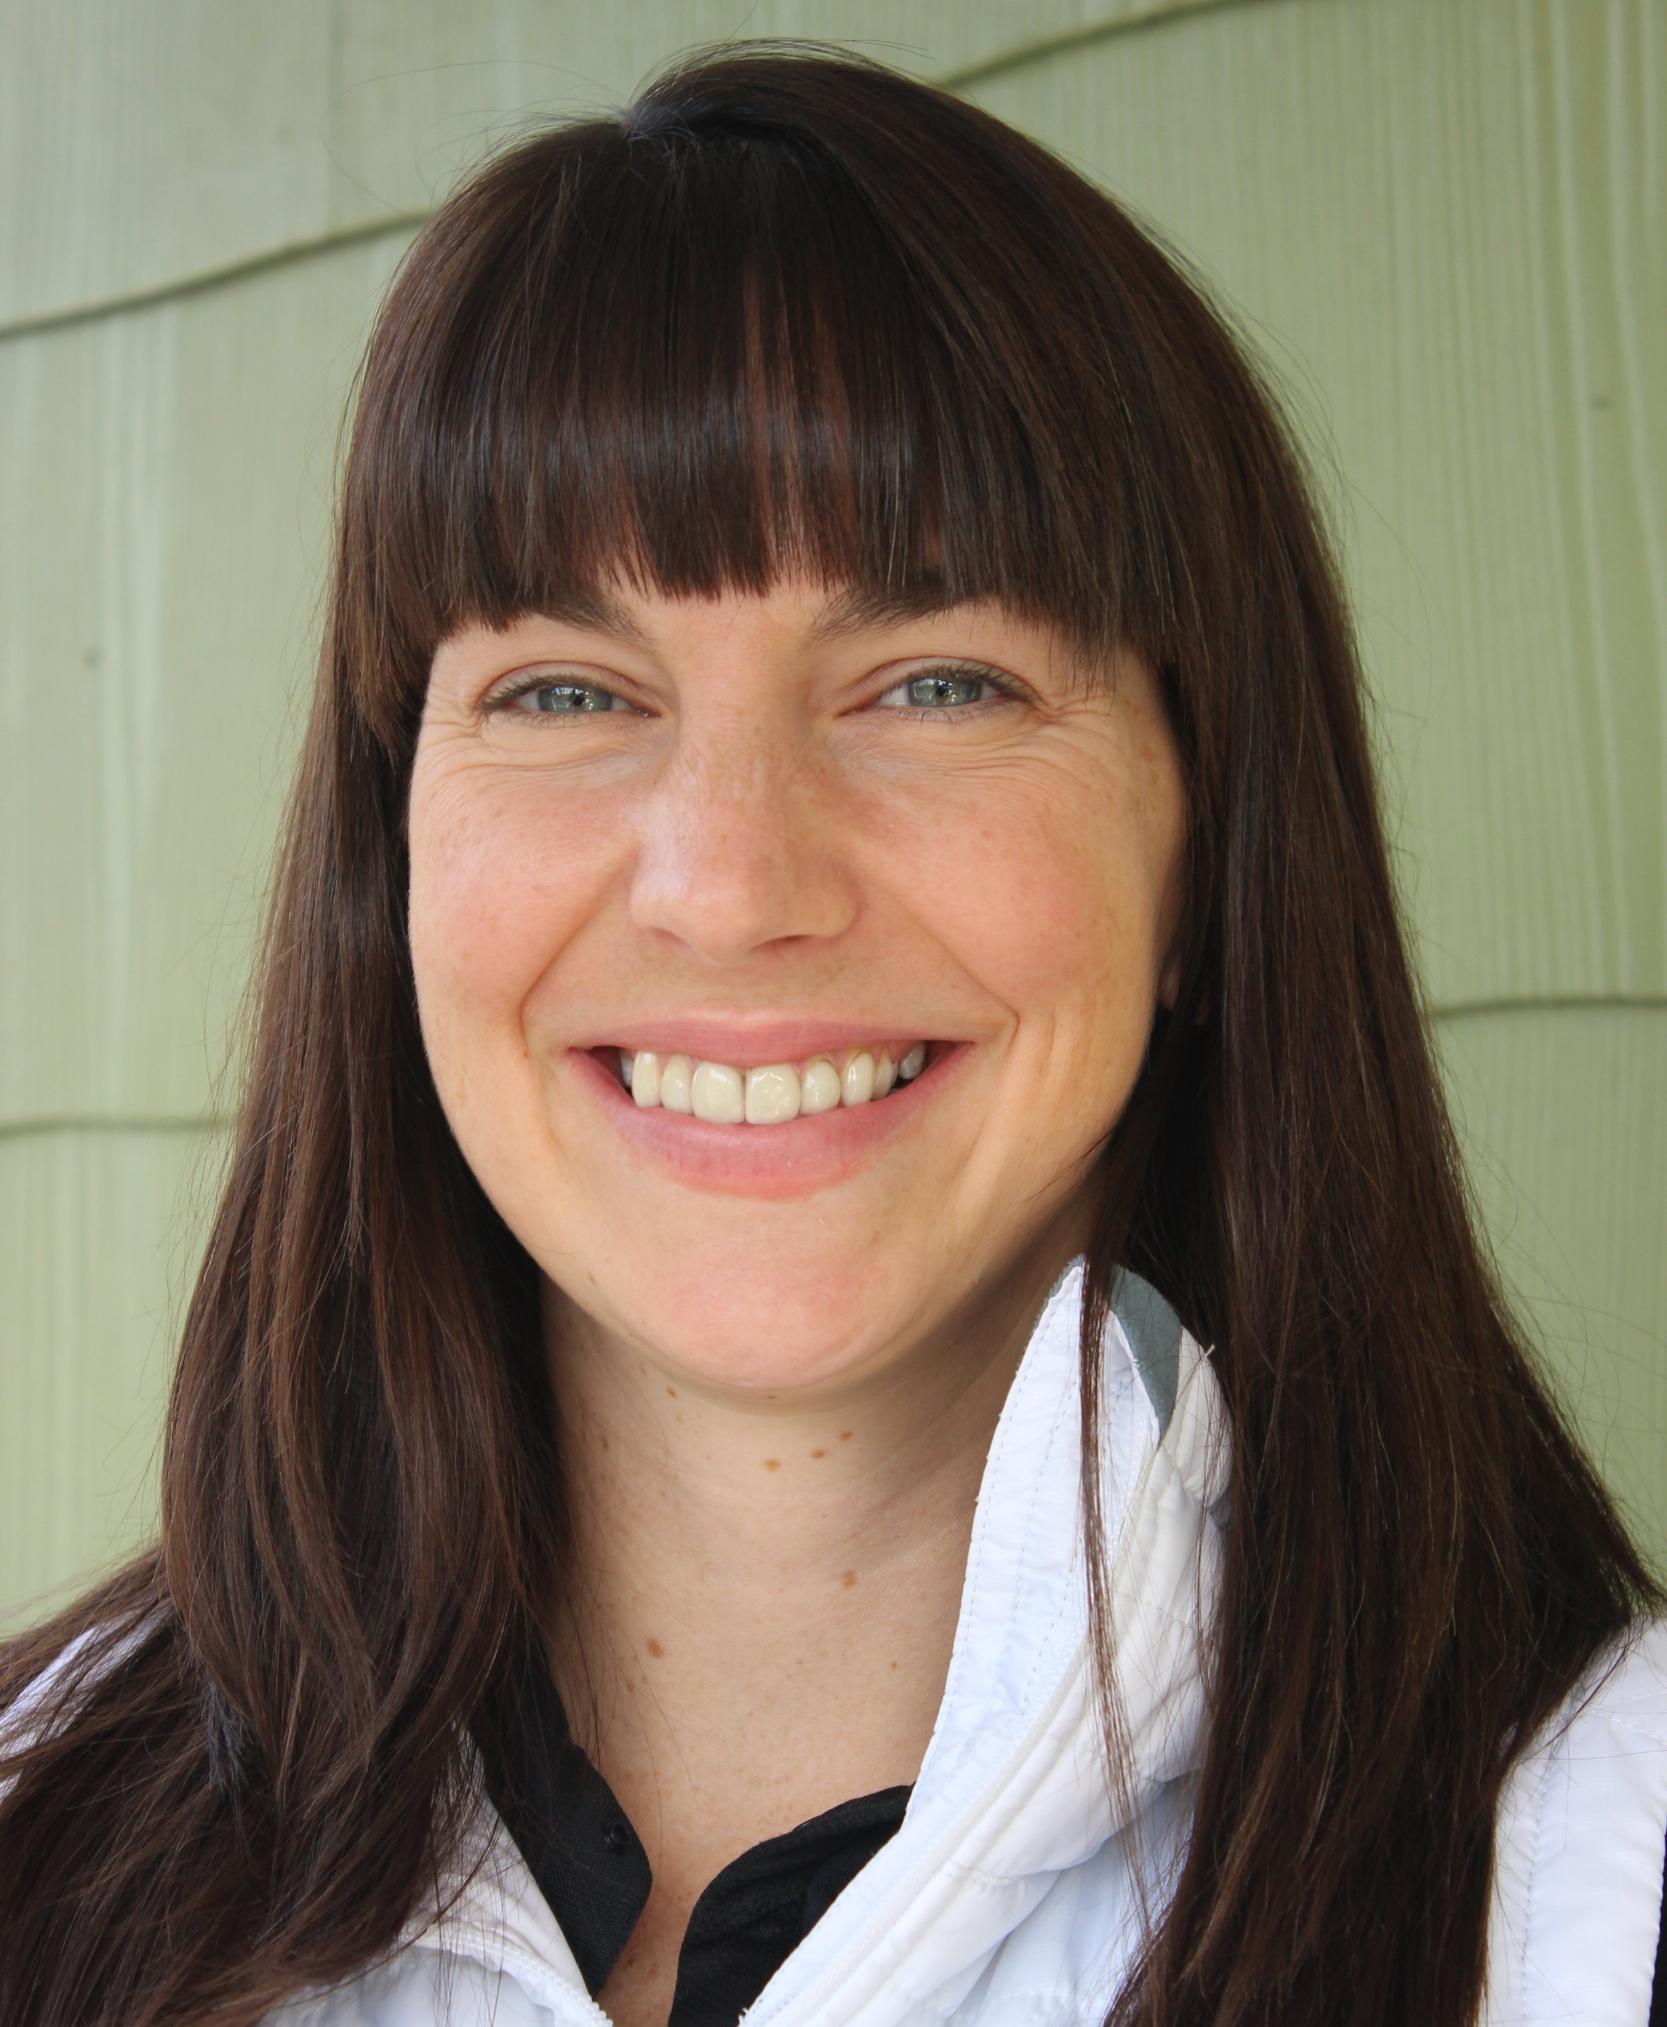 About Danielle - Member Since:2013Role: Advisory Council Member